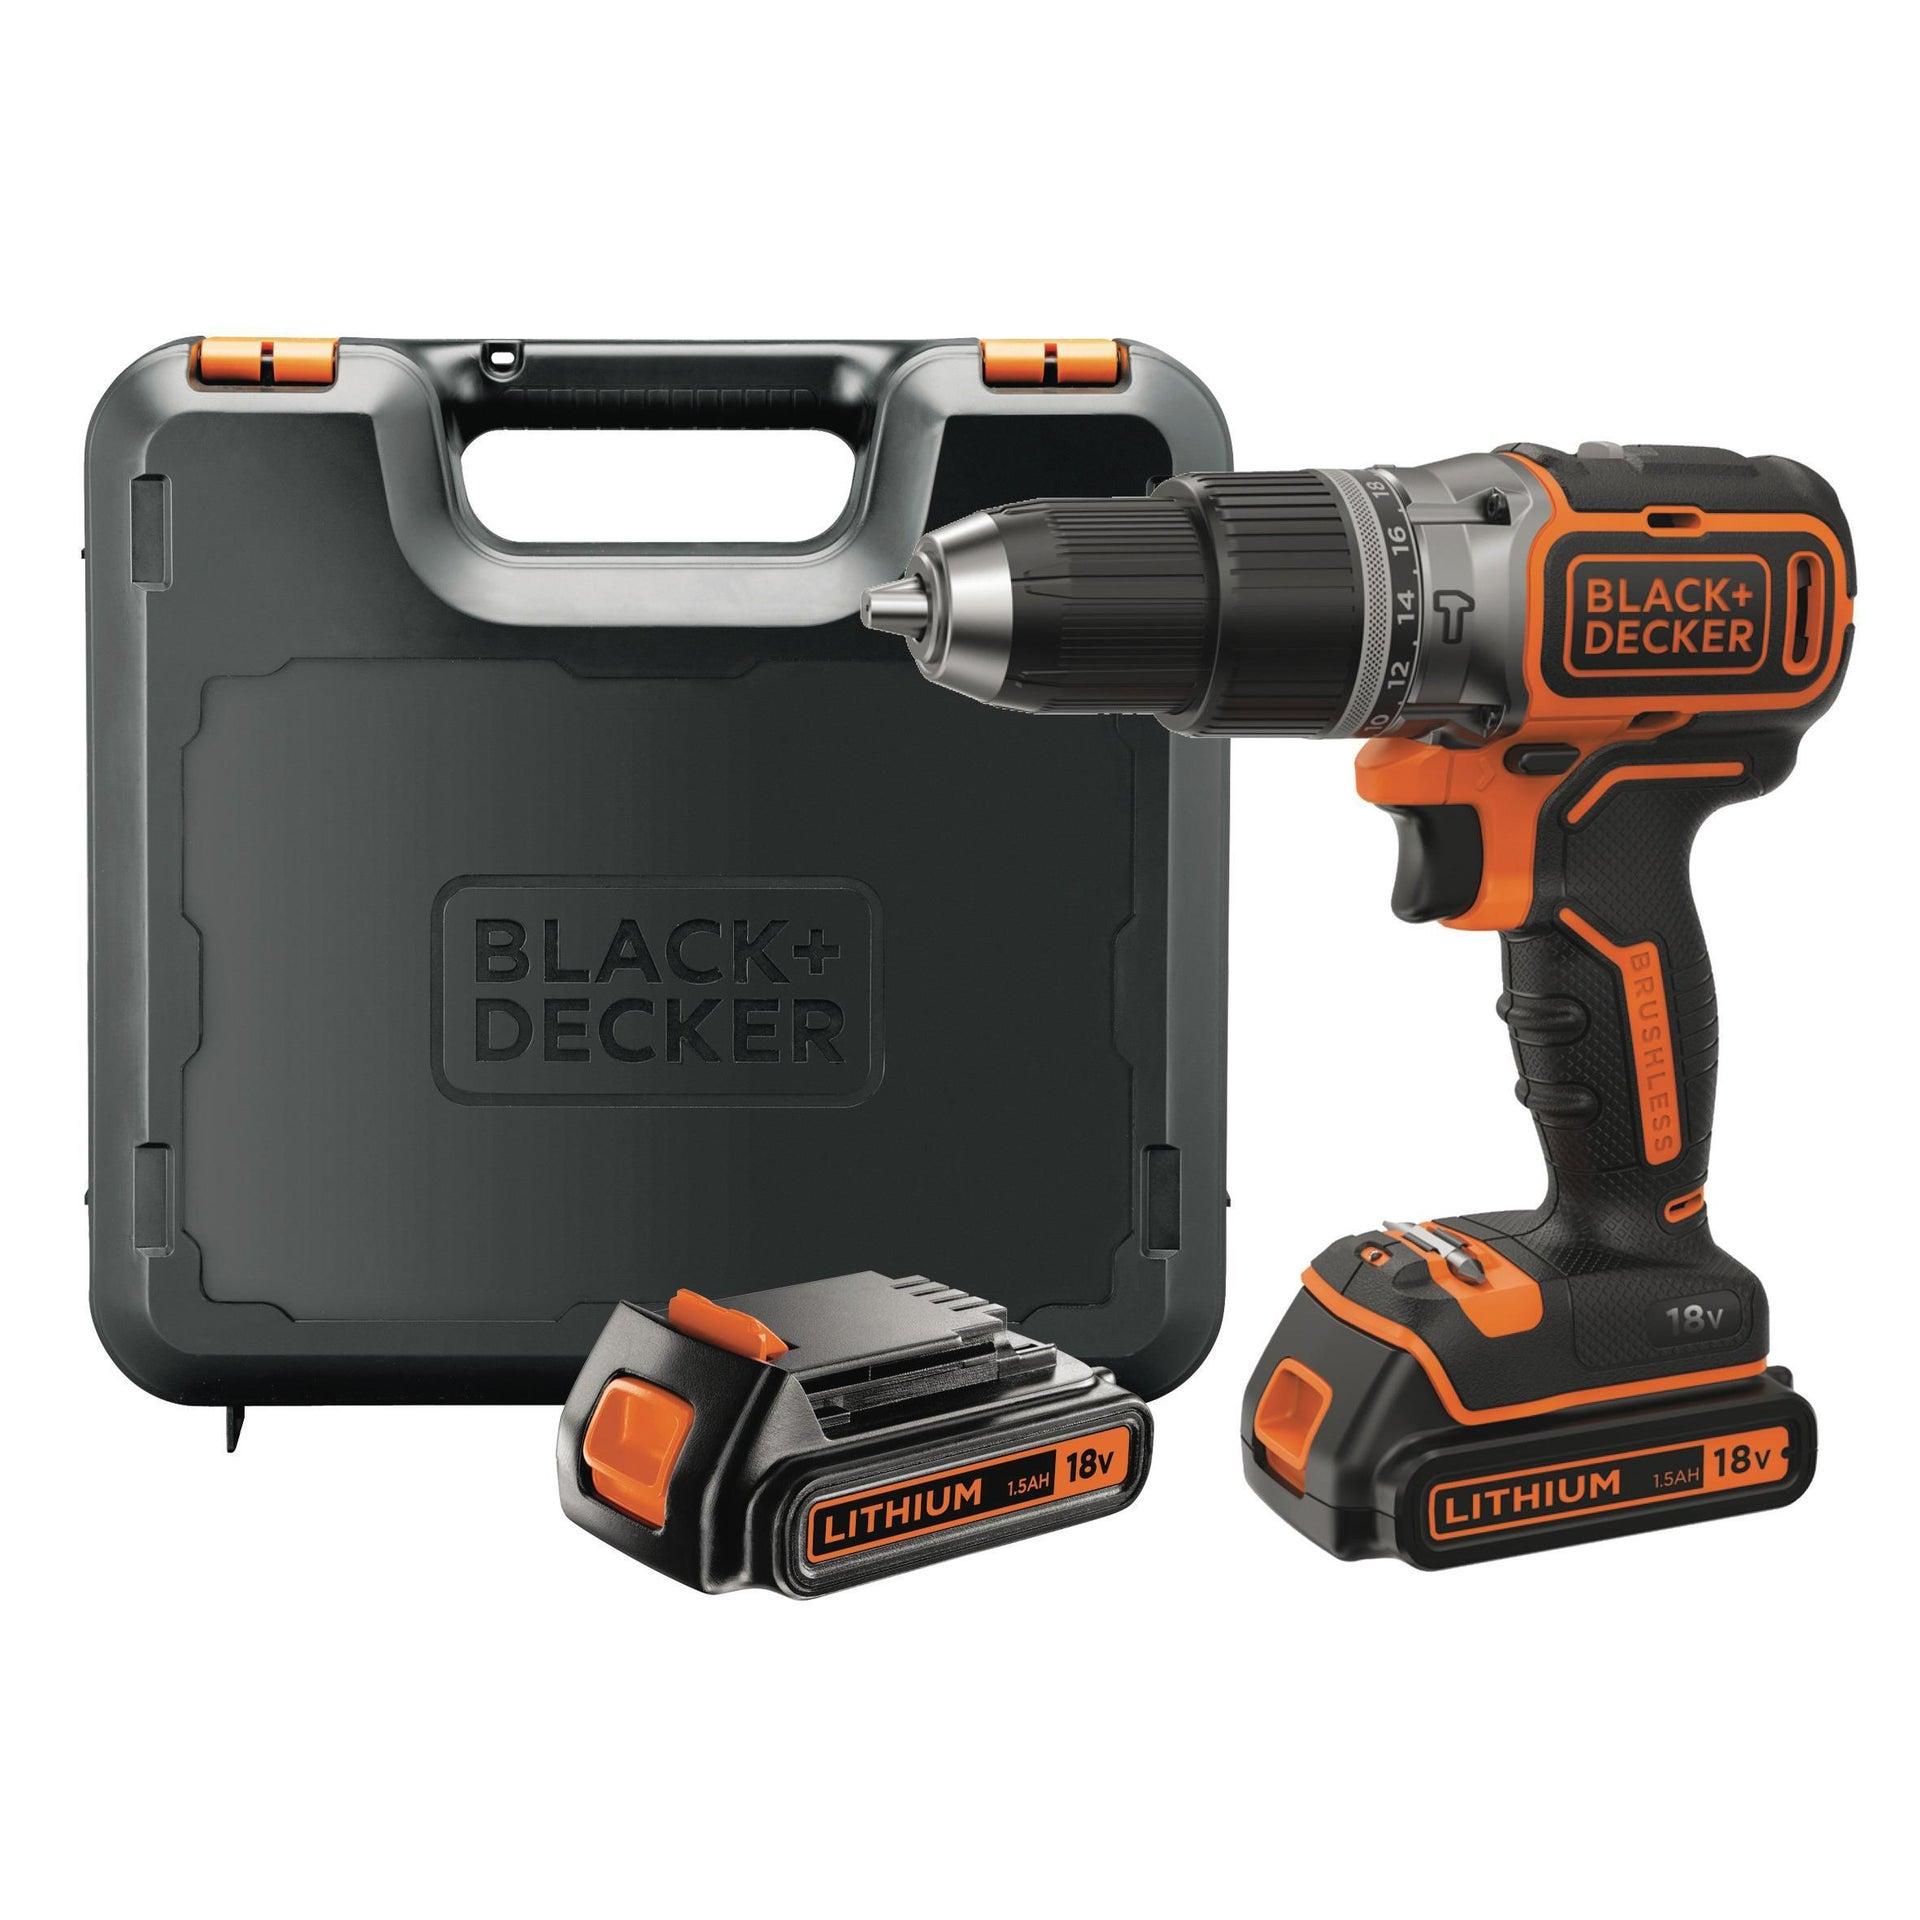 Trapano avvitatore a batteria BLACK + DECKER BL188KB-QW 18 V, 1.5 Ah, 2 batterie - 3